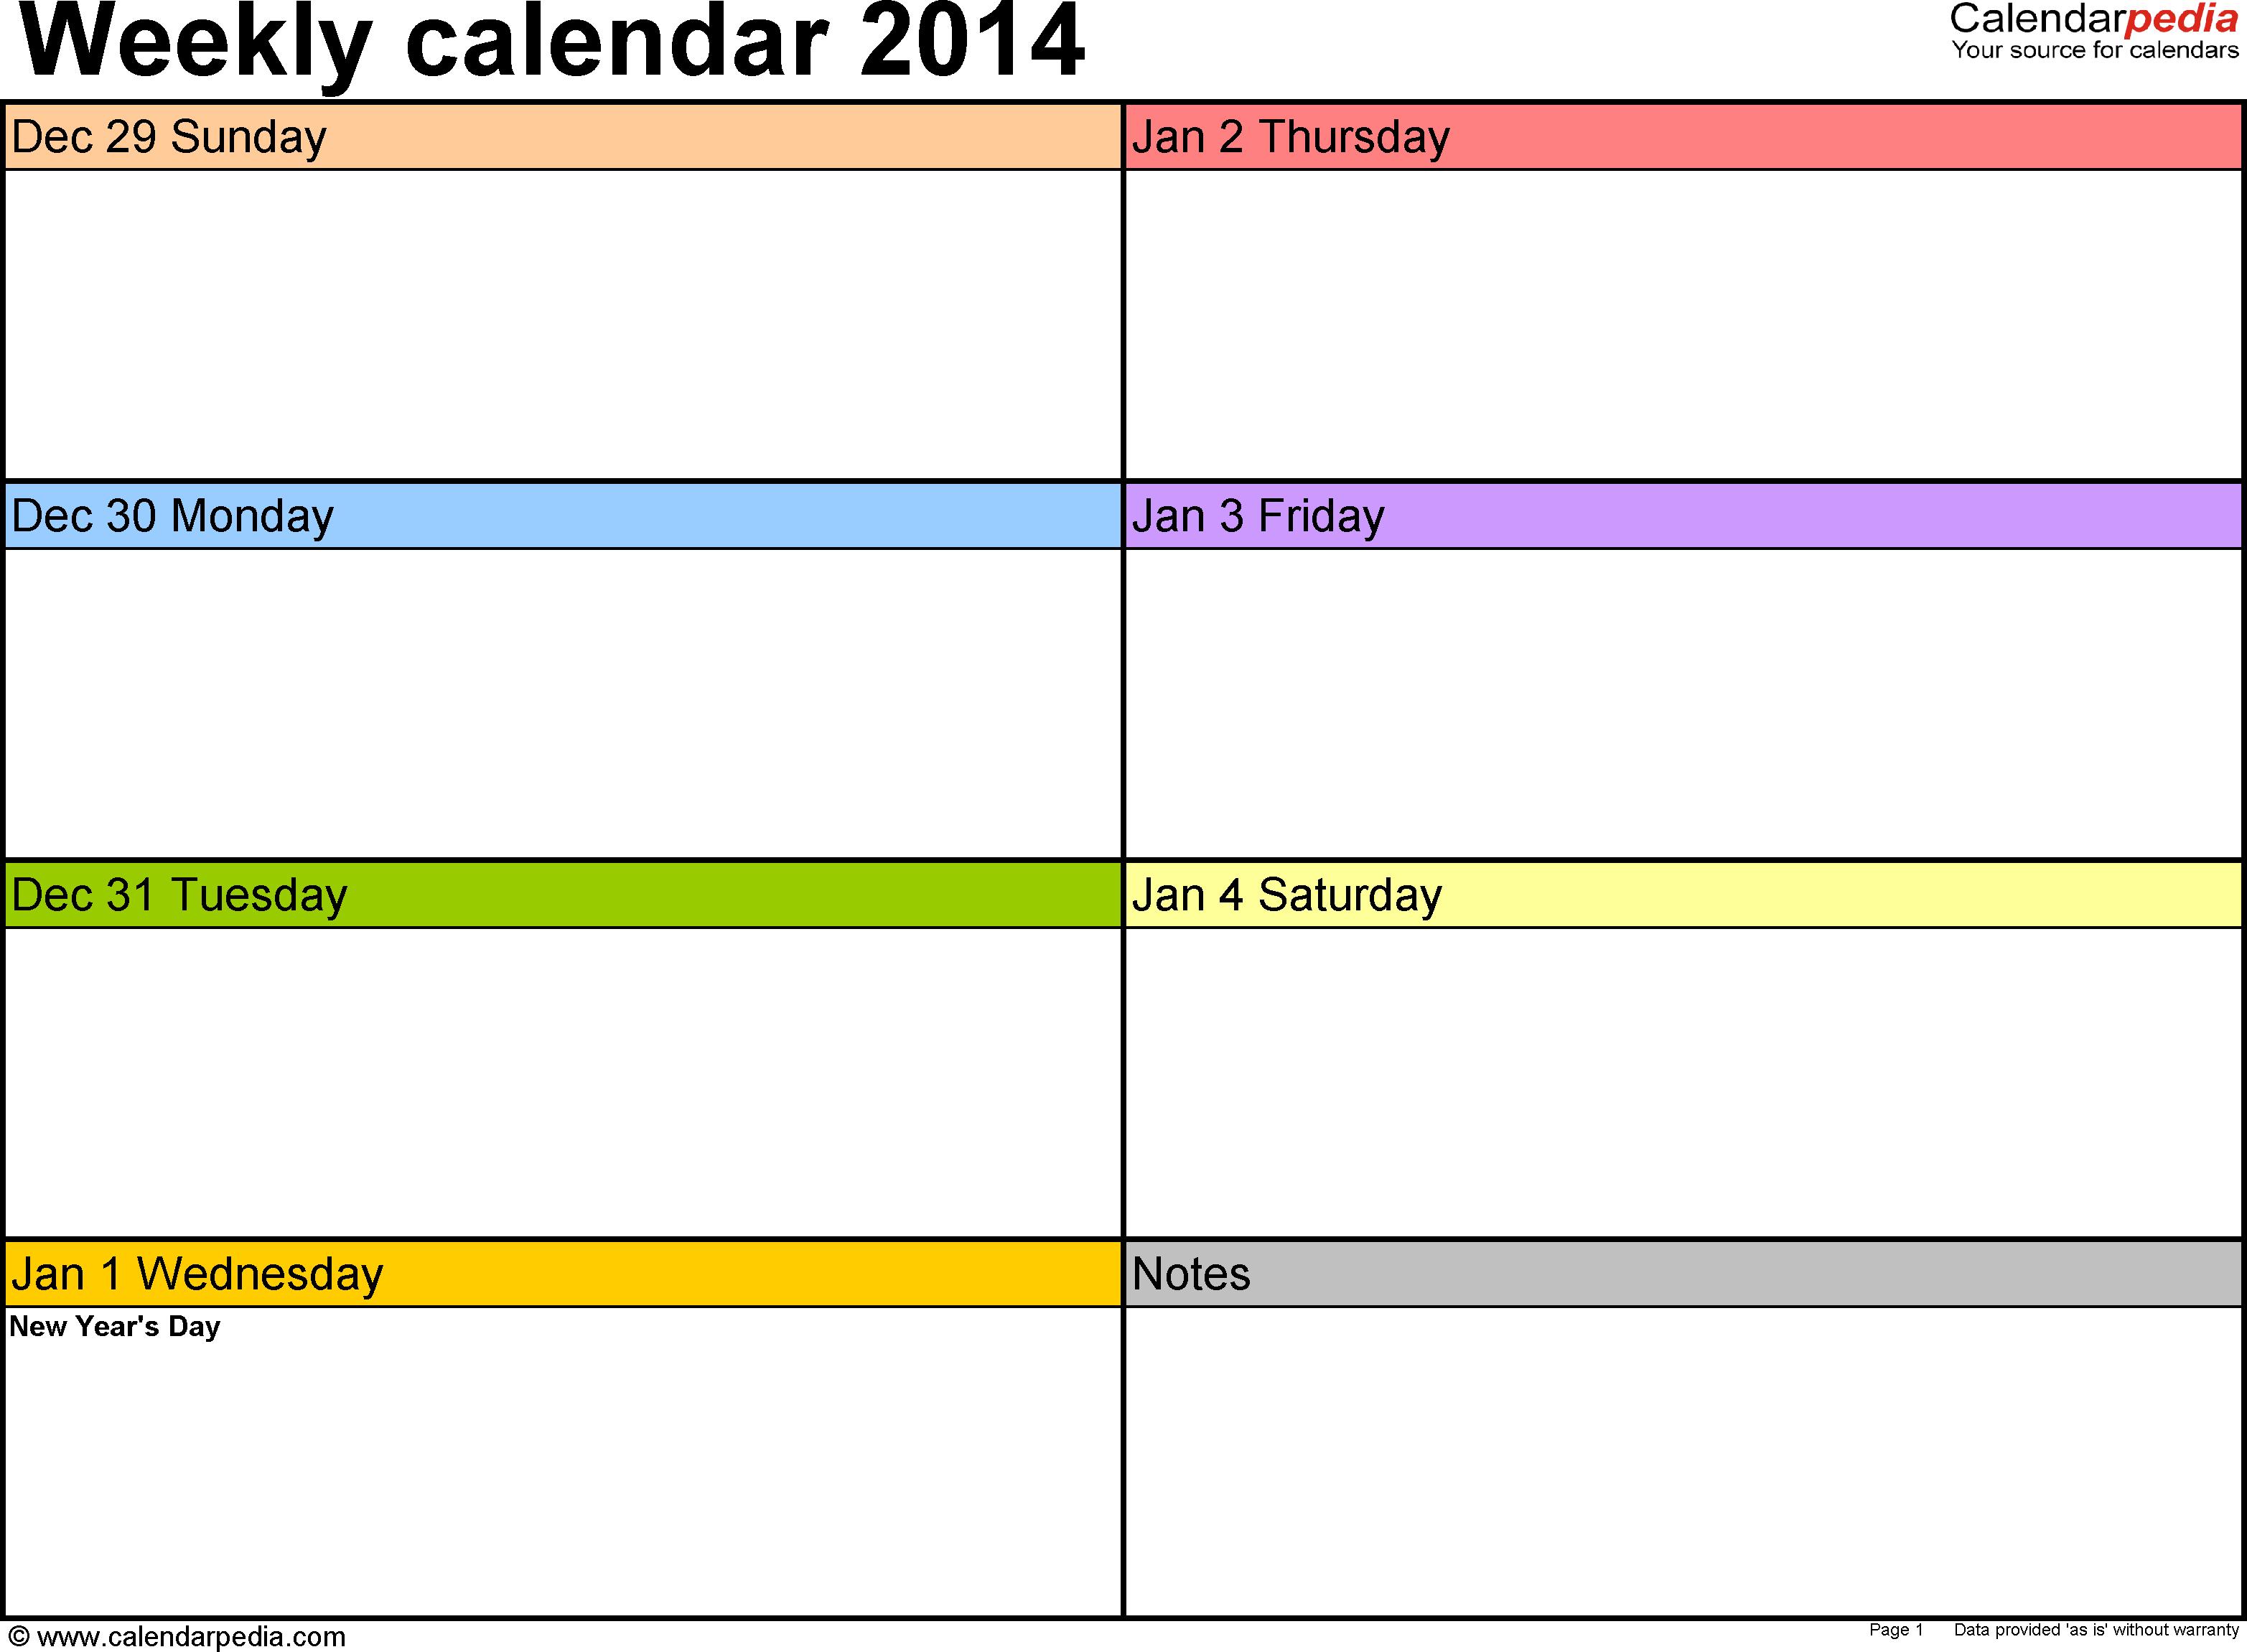 Weekly Calendar 2014 For Word - 4 Free Printable Templates - Free Printable School Agenda Templates